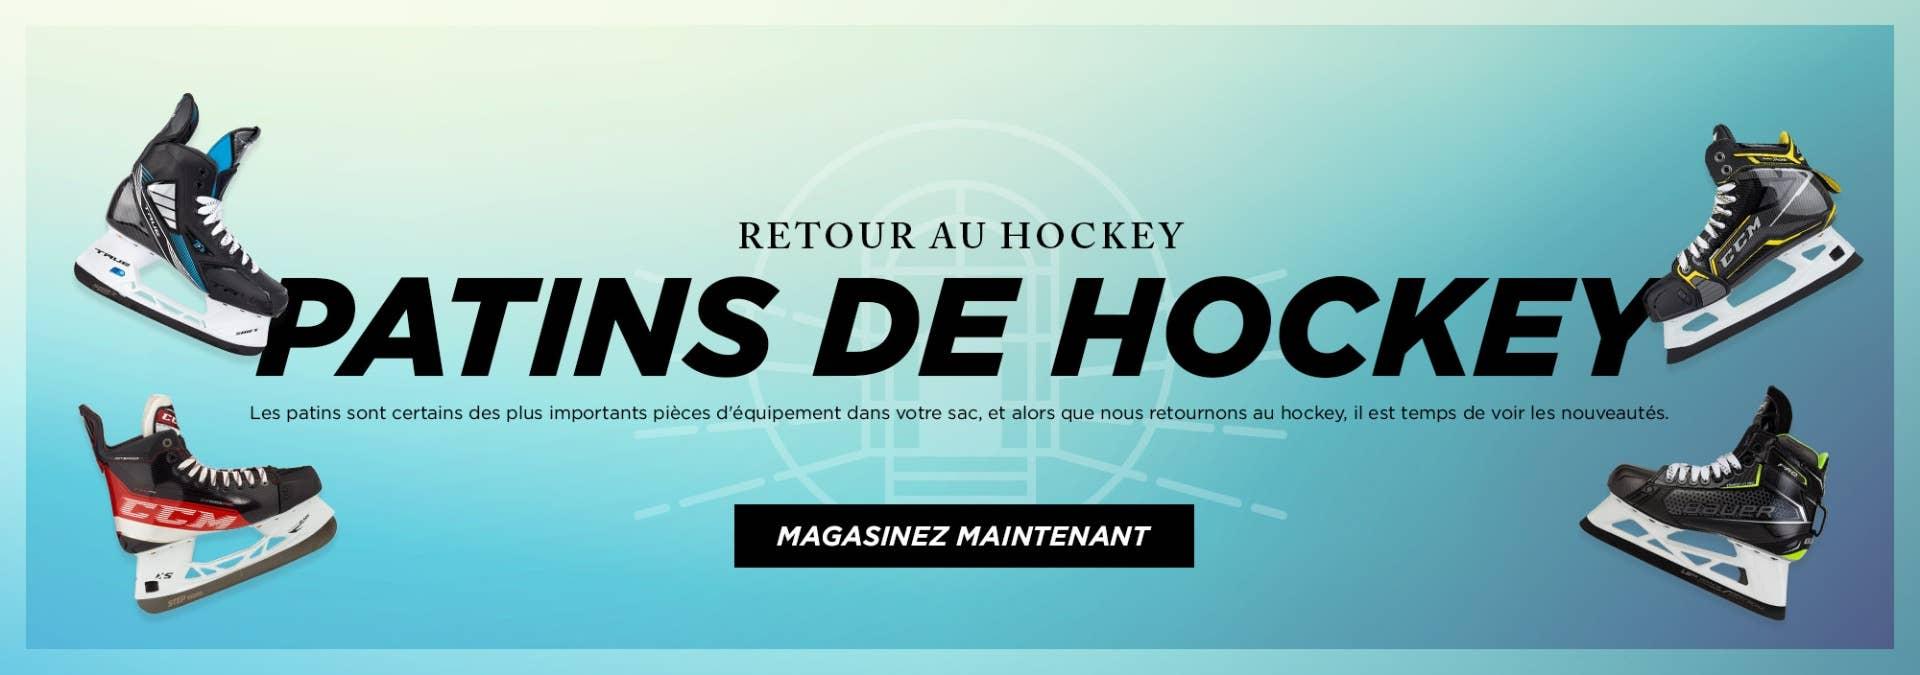 Retour au Hockey: Patins